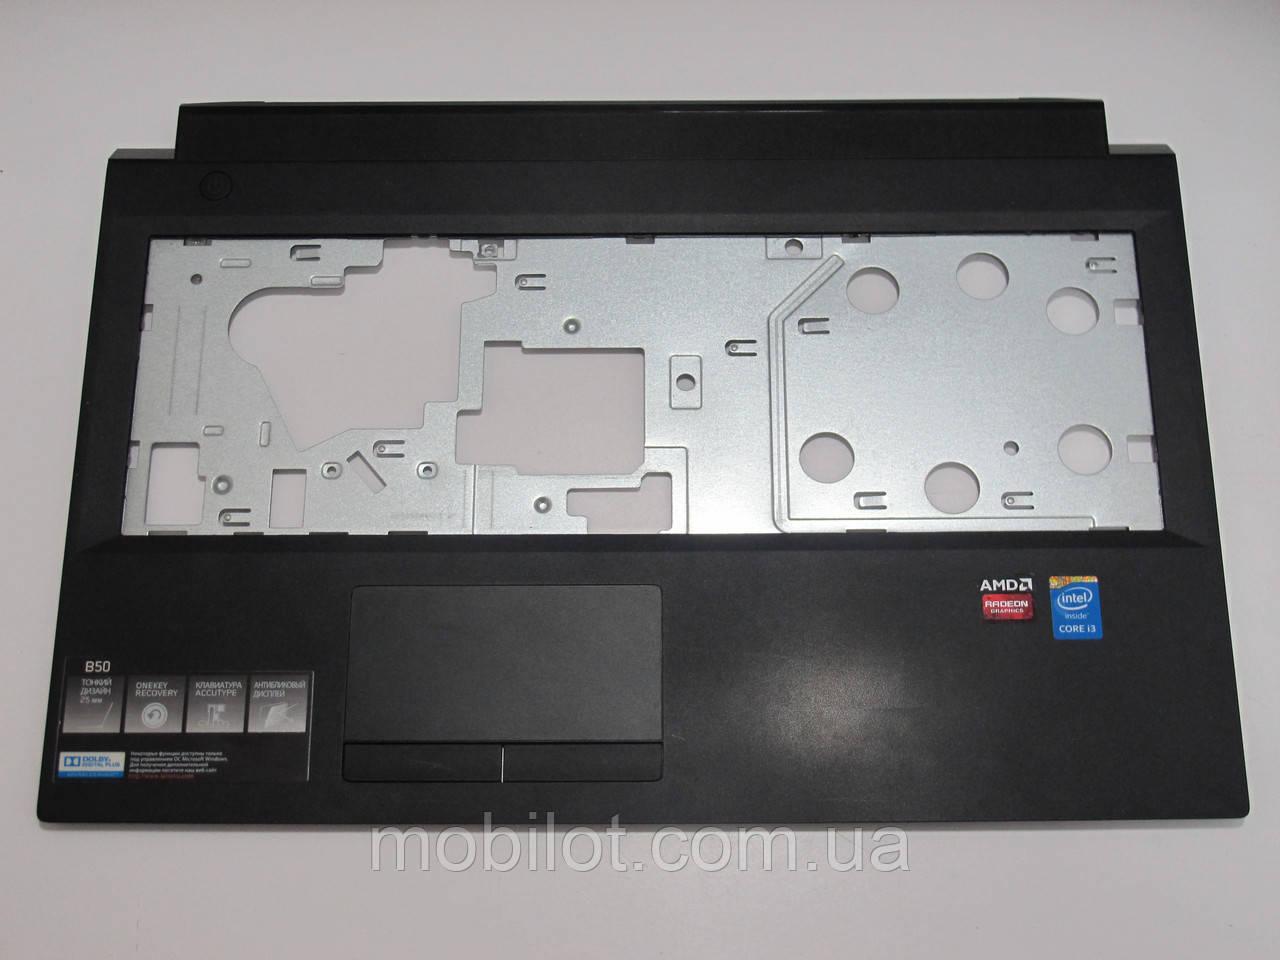 Часть корпуса (Стол) Lenovo B50-70 (NZ-5981)